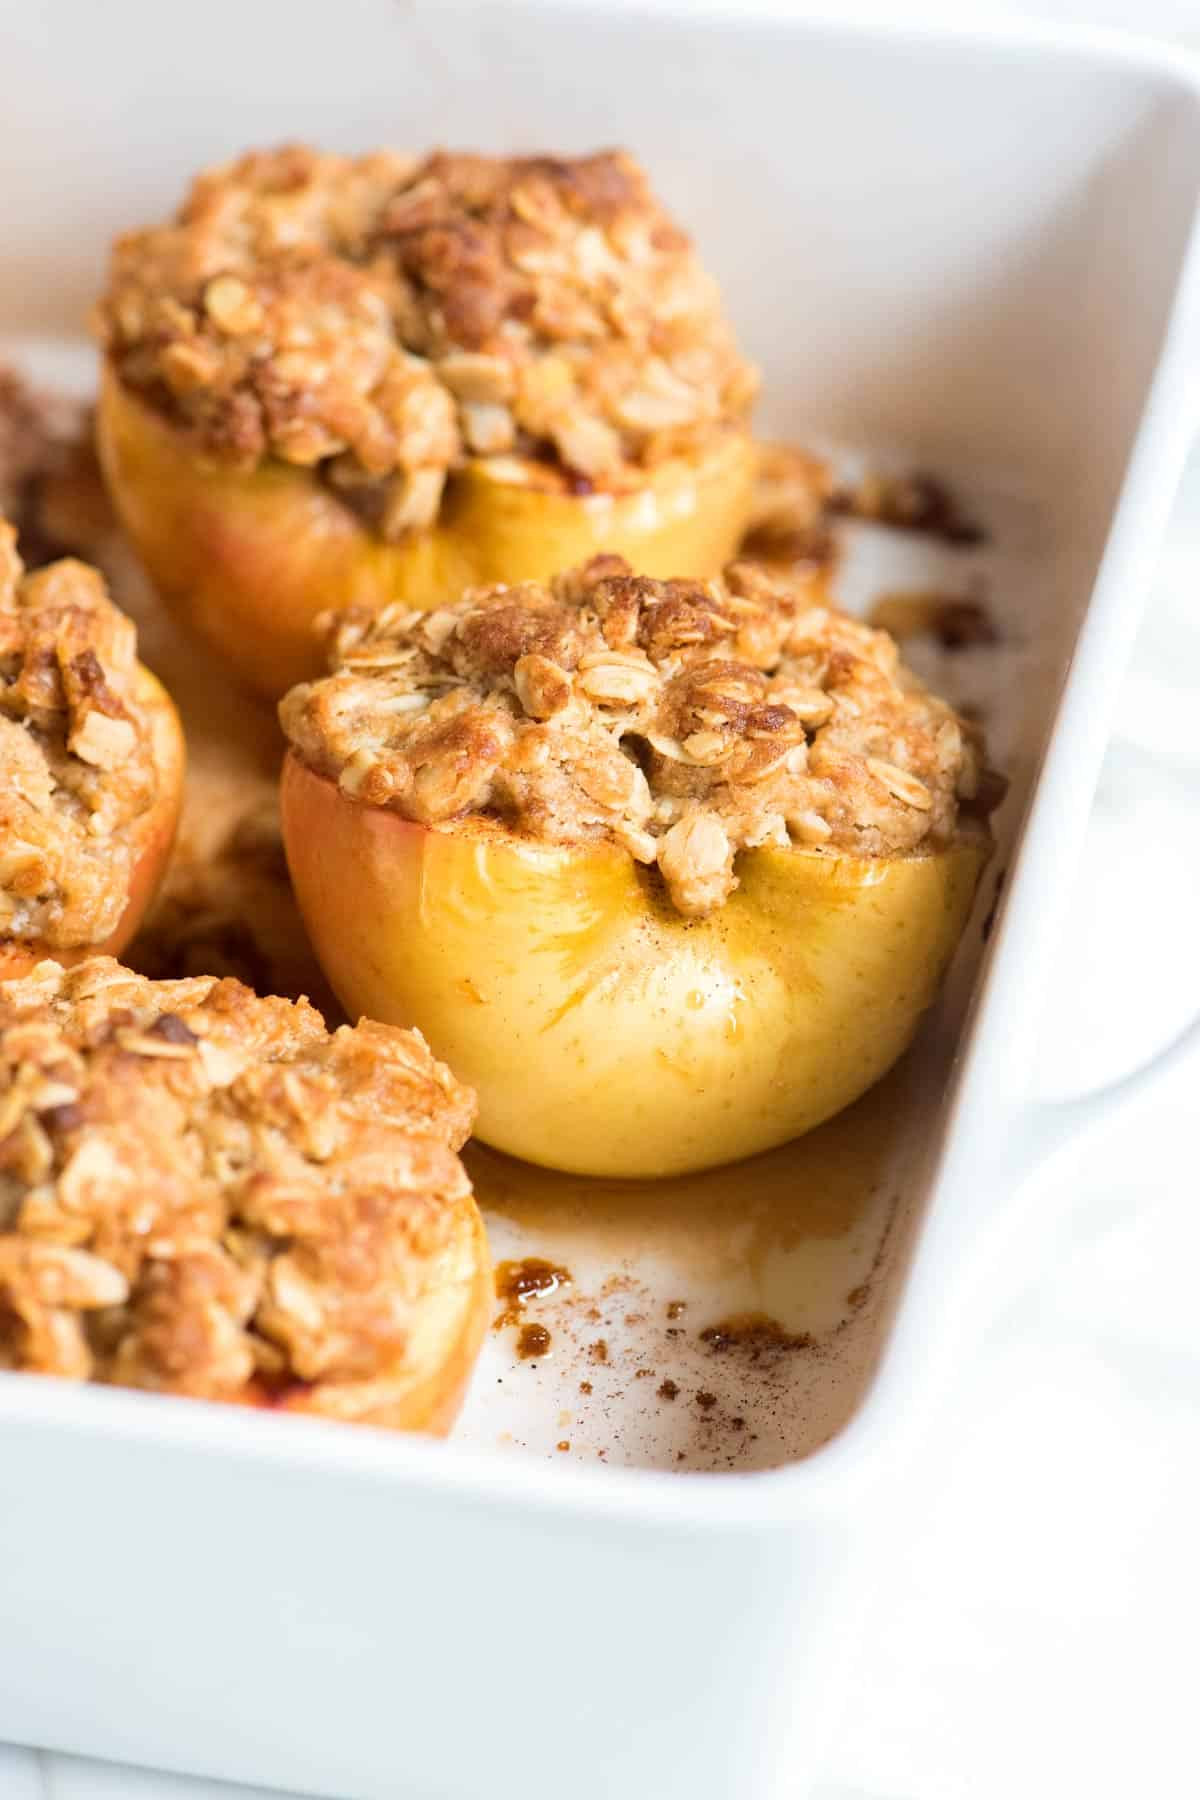 Dessert With Apples  Easy Baked Cinnamon Apples Recipe